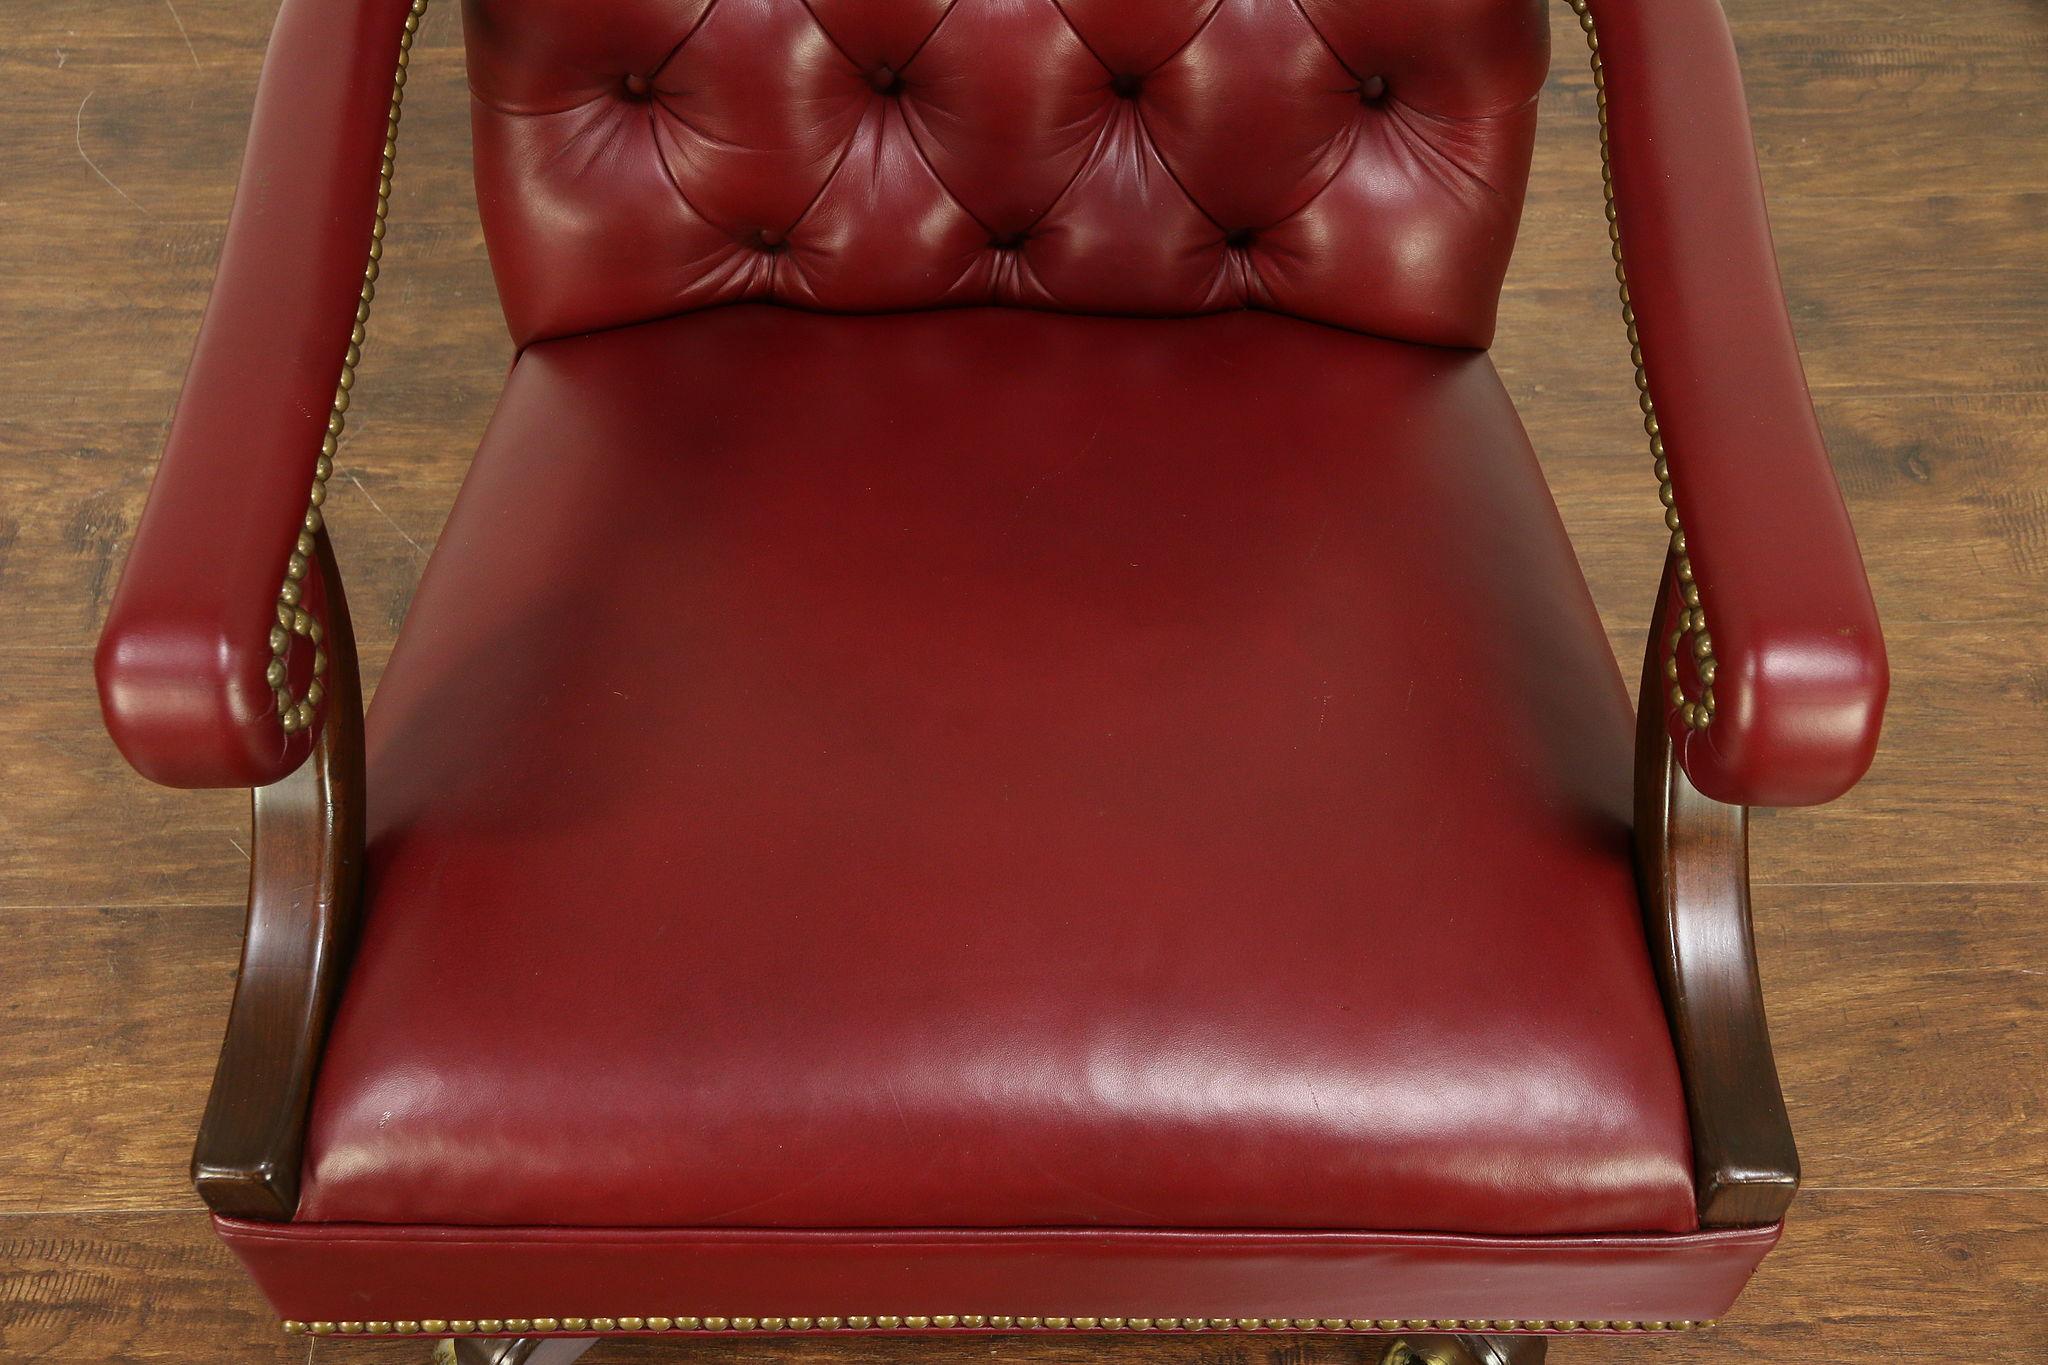 Cool Harden Cherry Traditional Swivel Adjustable Desk Chair Faux Leather 30536 Short Links Chair Design For Home Short Linksinfo